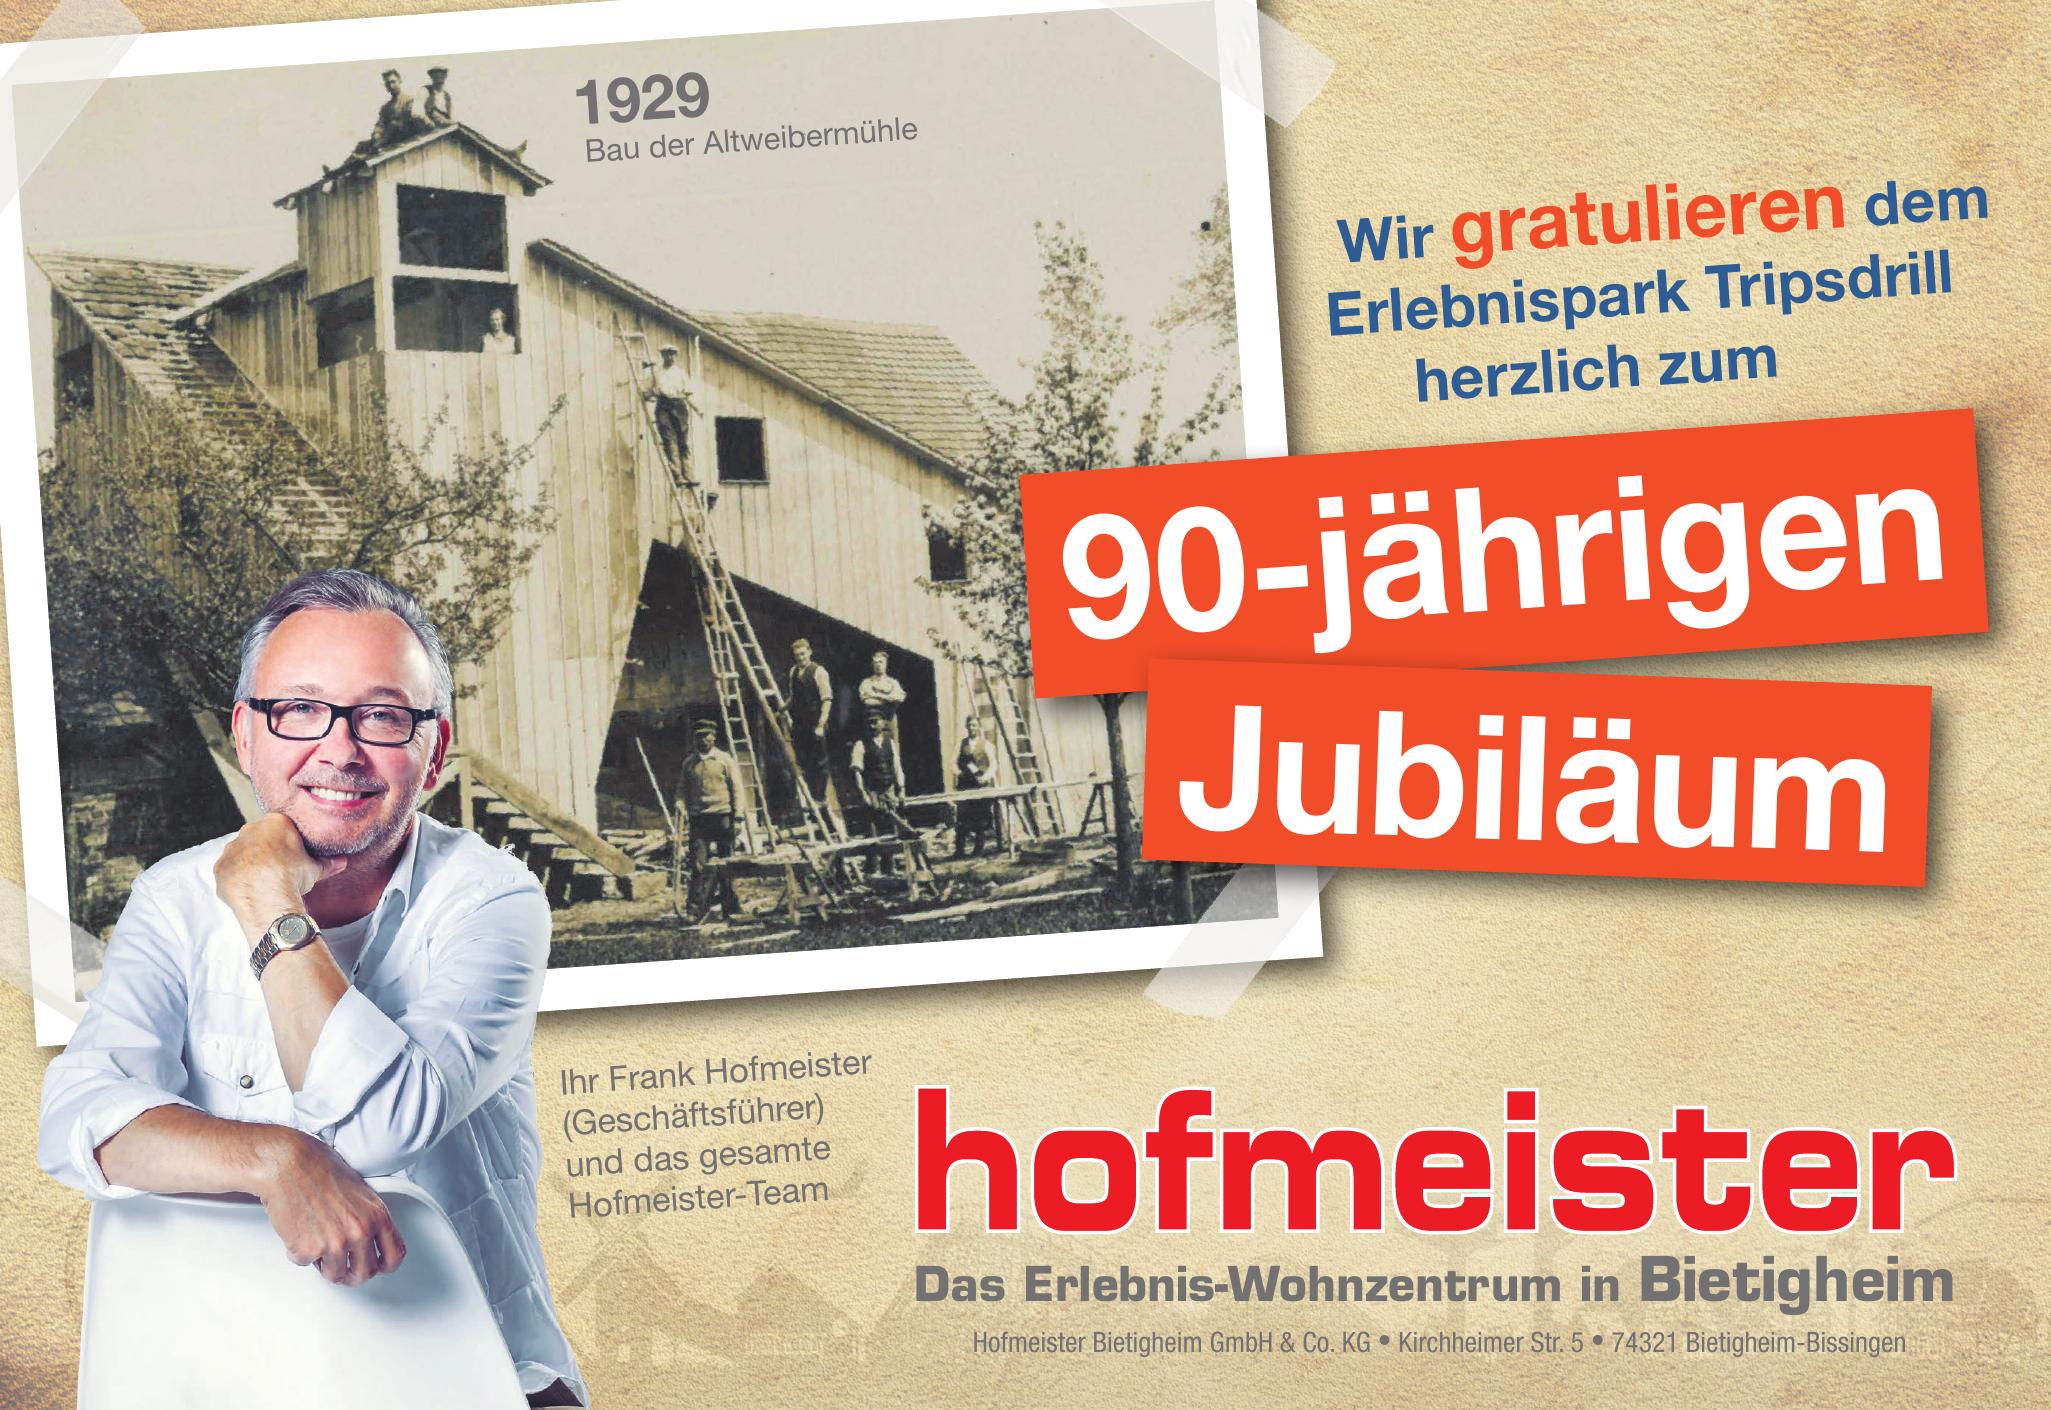 Hofmeister Bietigheim GmbH & Co. KG